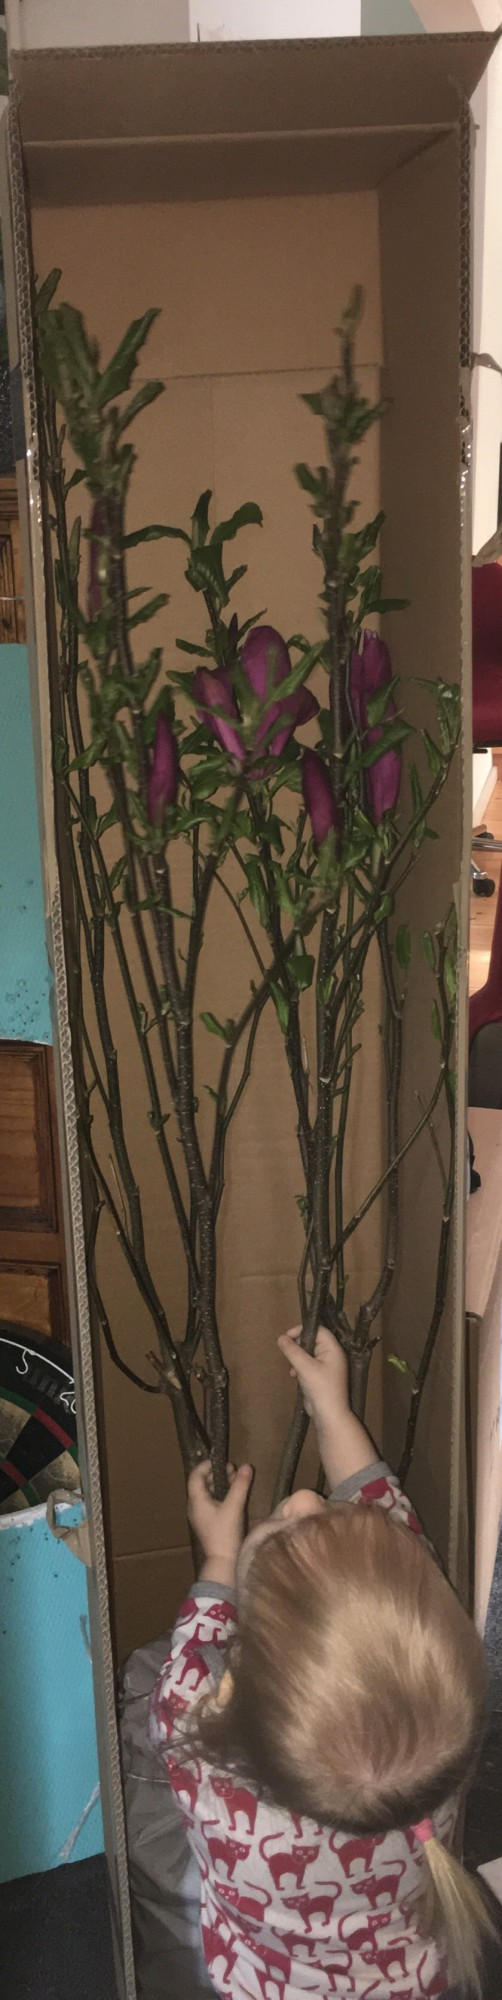 magnolie-karton